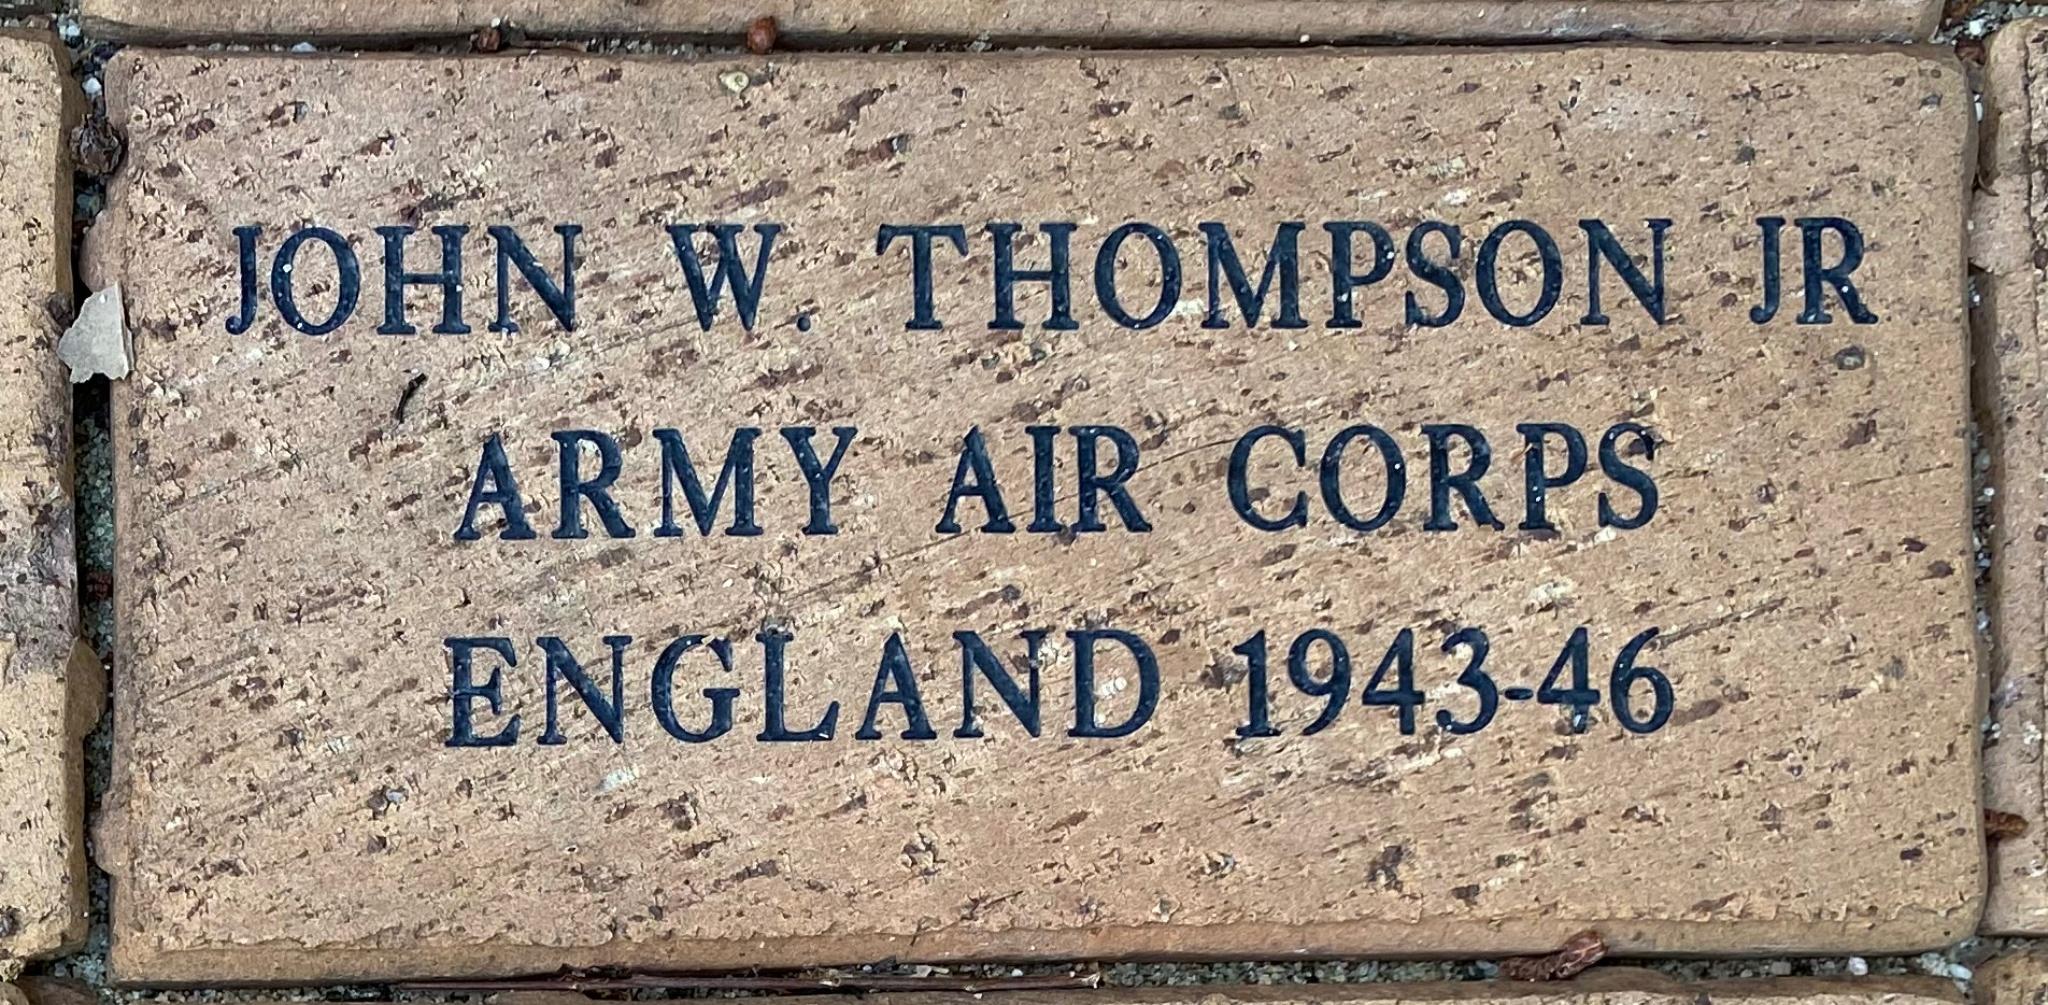 JOHN W THOMPSON JR ARMY AIR CORPS ENGLAND 1943-46